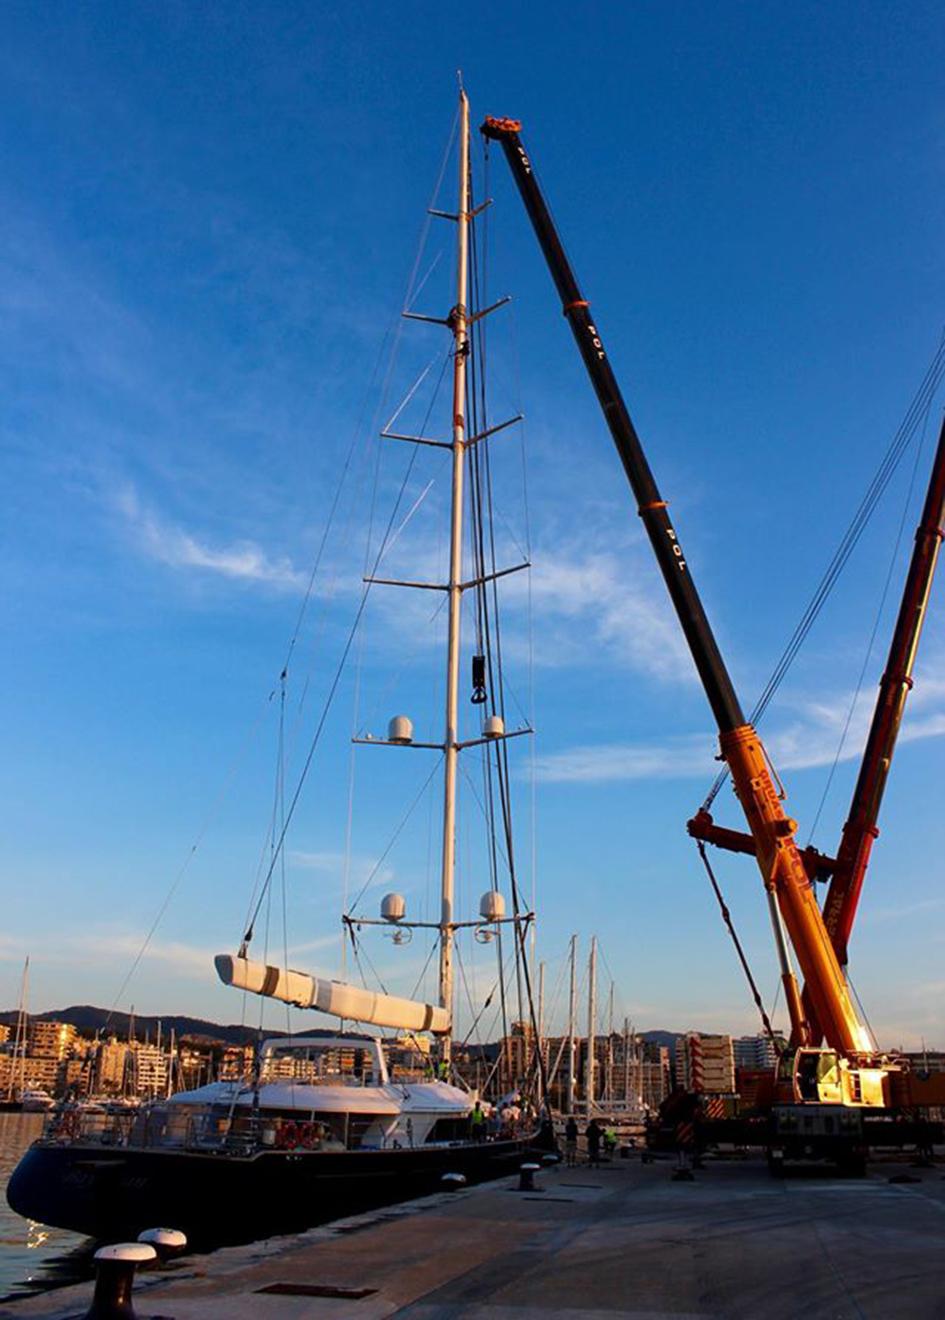 a-crane-sizes-up-the-mast-of-56m-perini-navi-sailing-super-yacht-bayesian